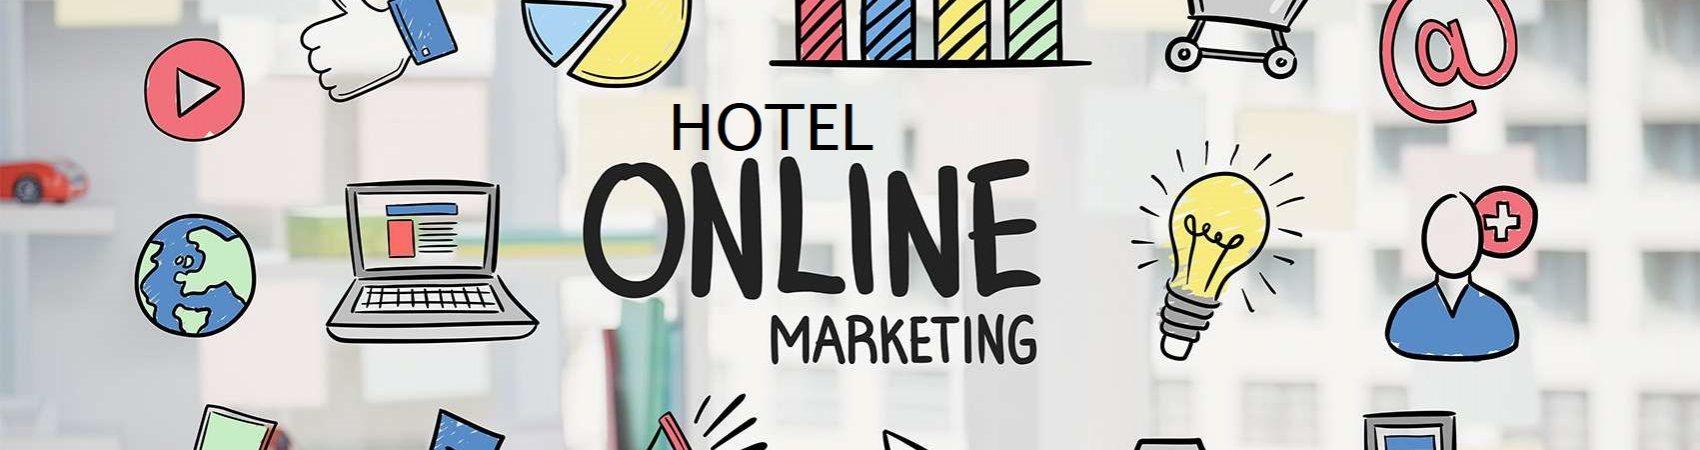 online marketig